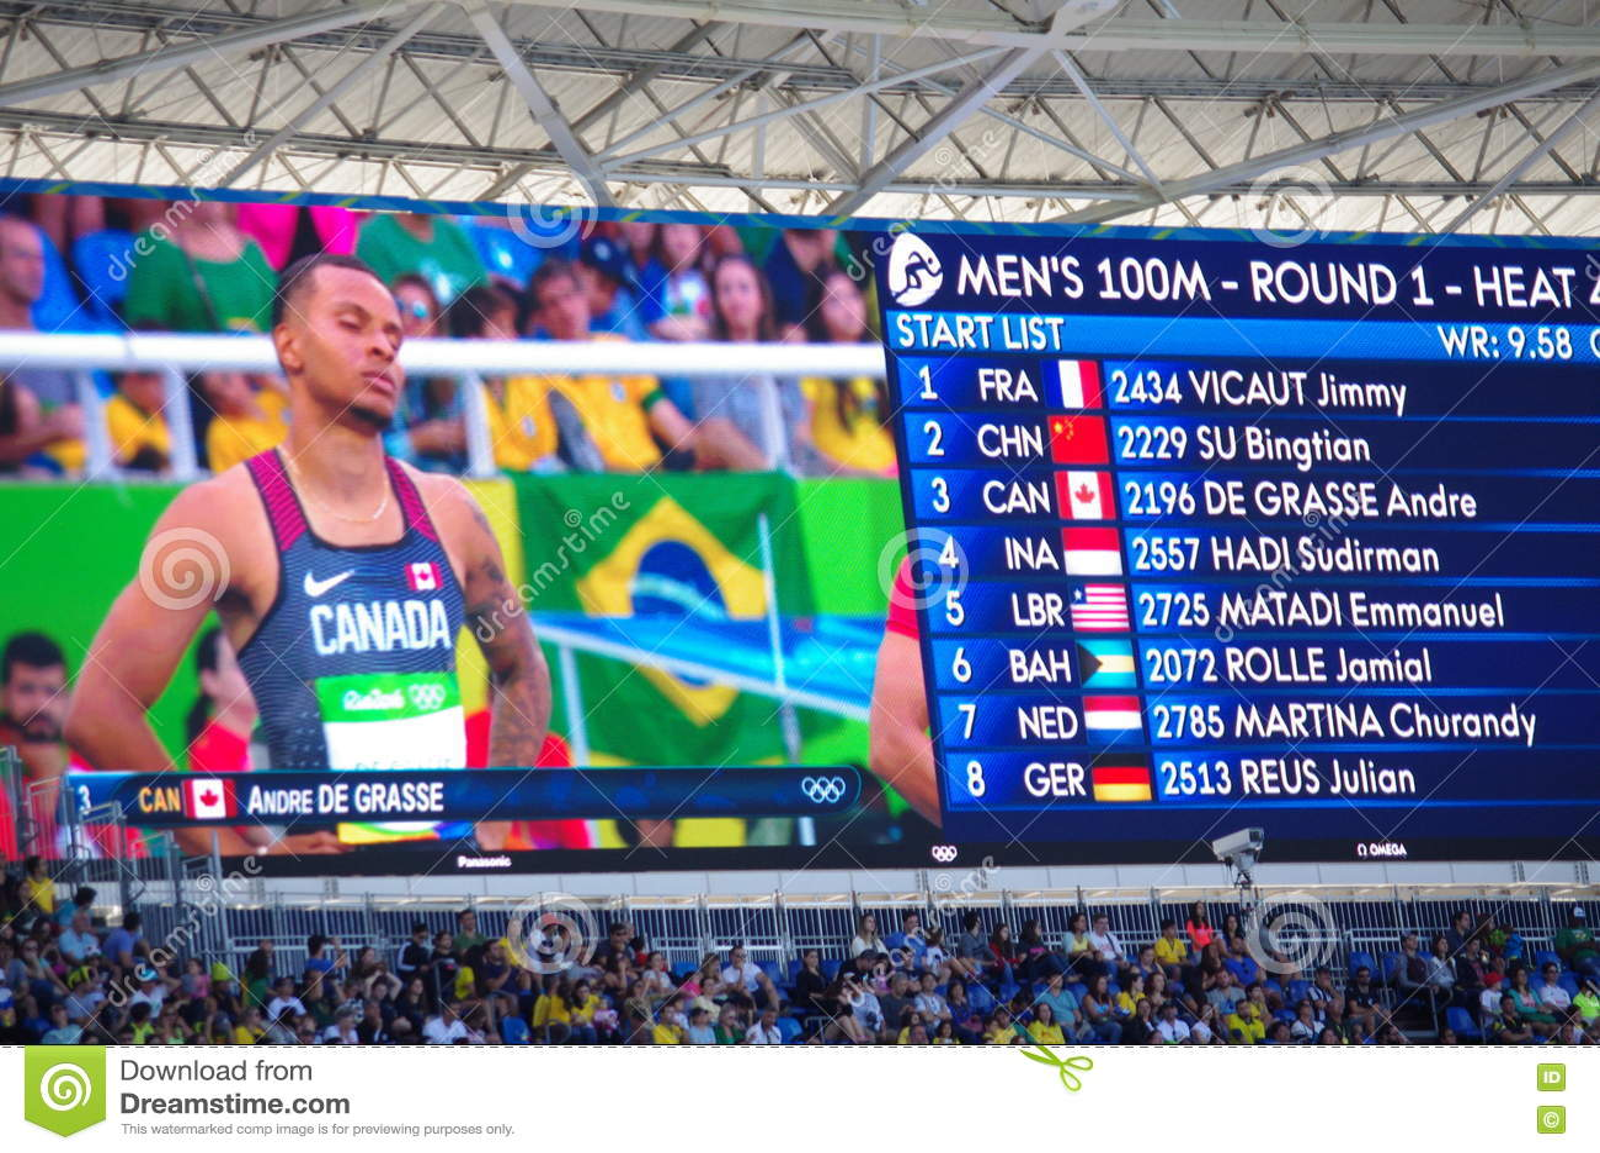 Rio2016 οθόνη Ολυμπιακών Αγώνων με το Andre de Grasse